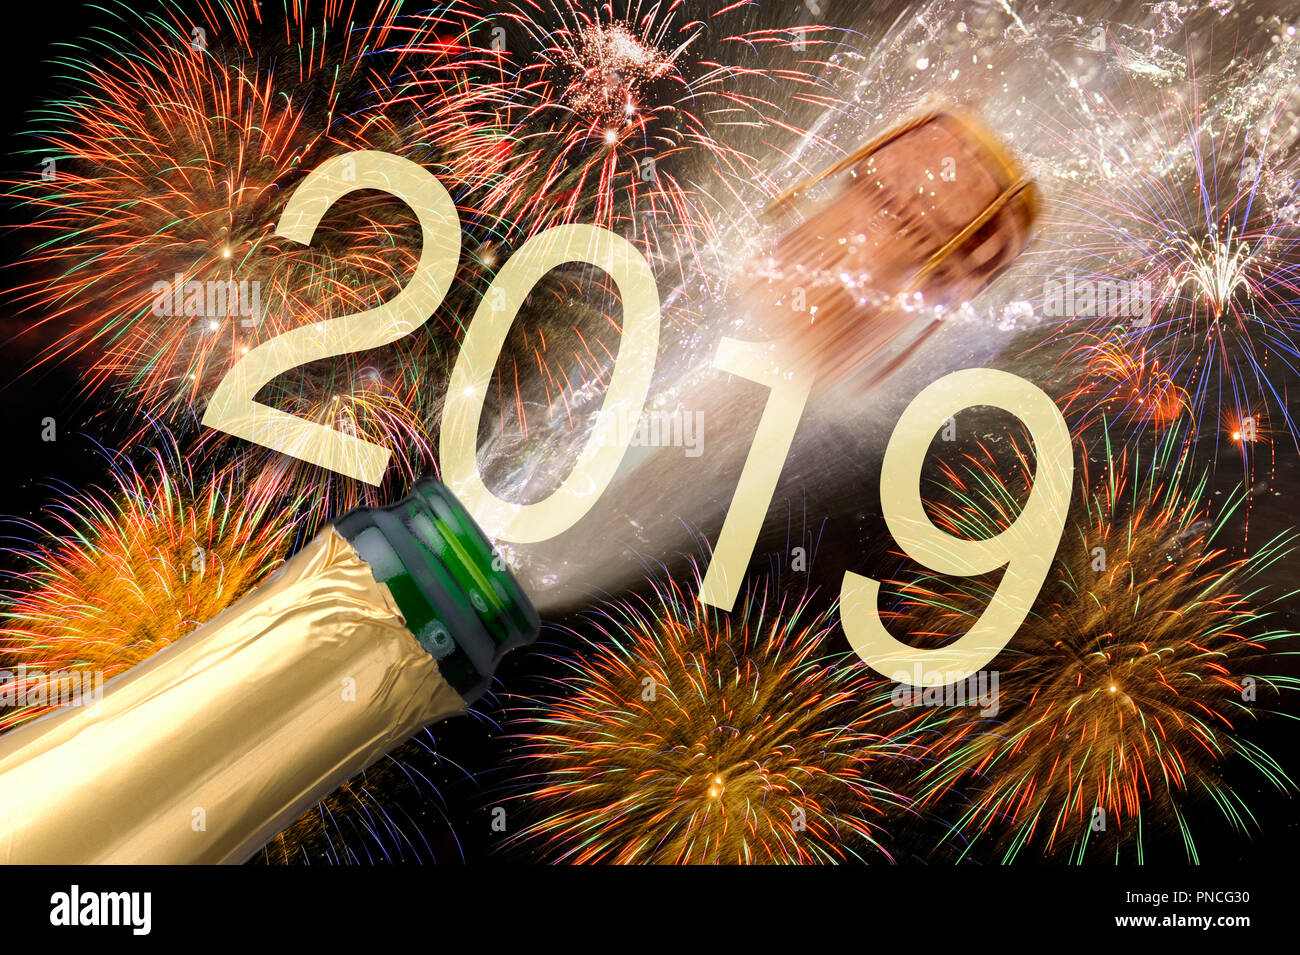 Midnight New Years Eve